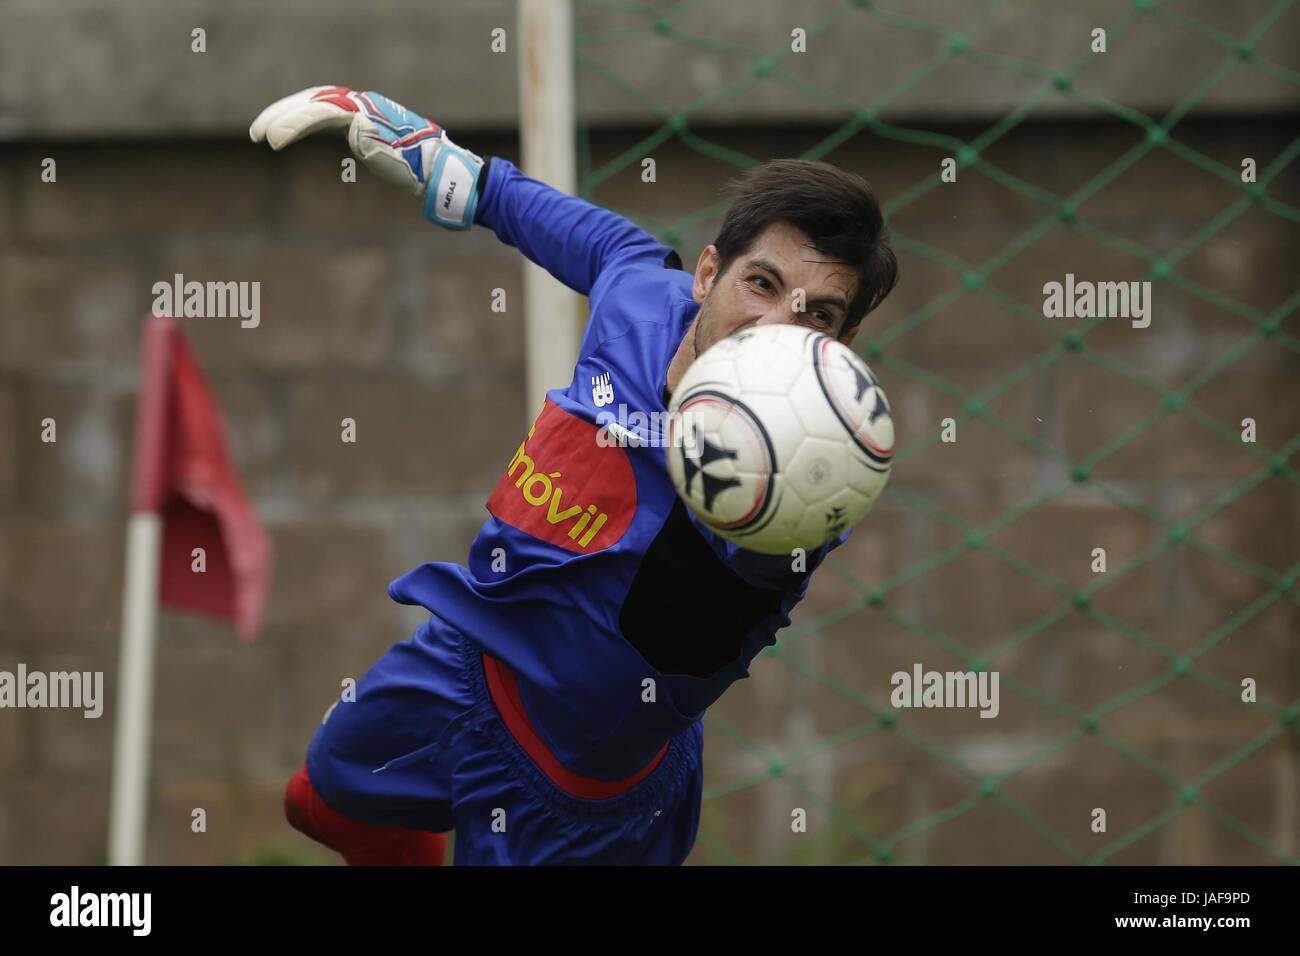 Panamas National Soccer Team Goalkeeper Jaime Penedo Participates In A Training Session In San Salvador El Salvador